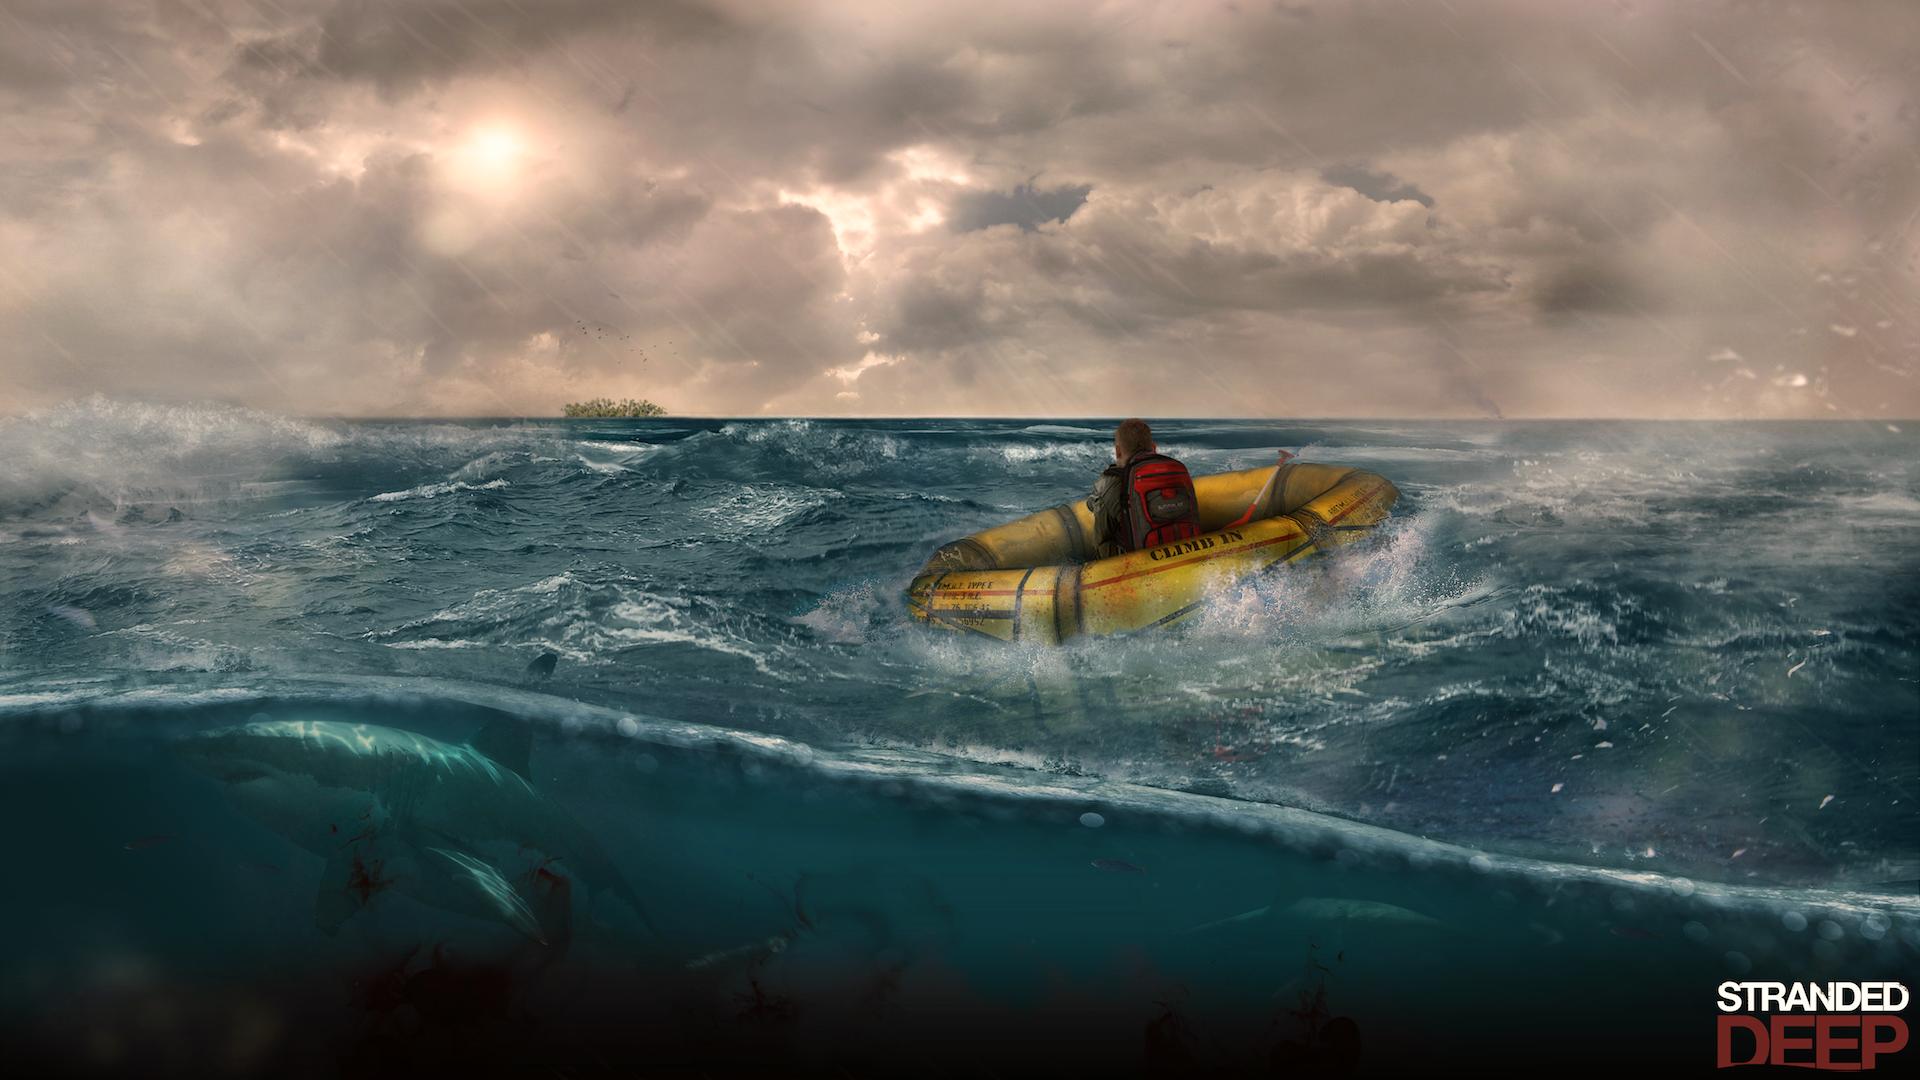 stranded-deep-speed-art-1080p